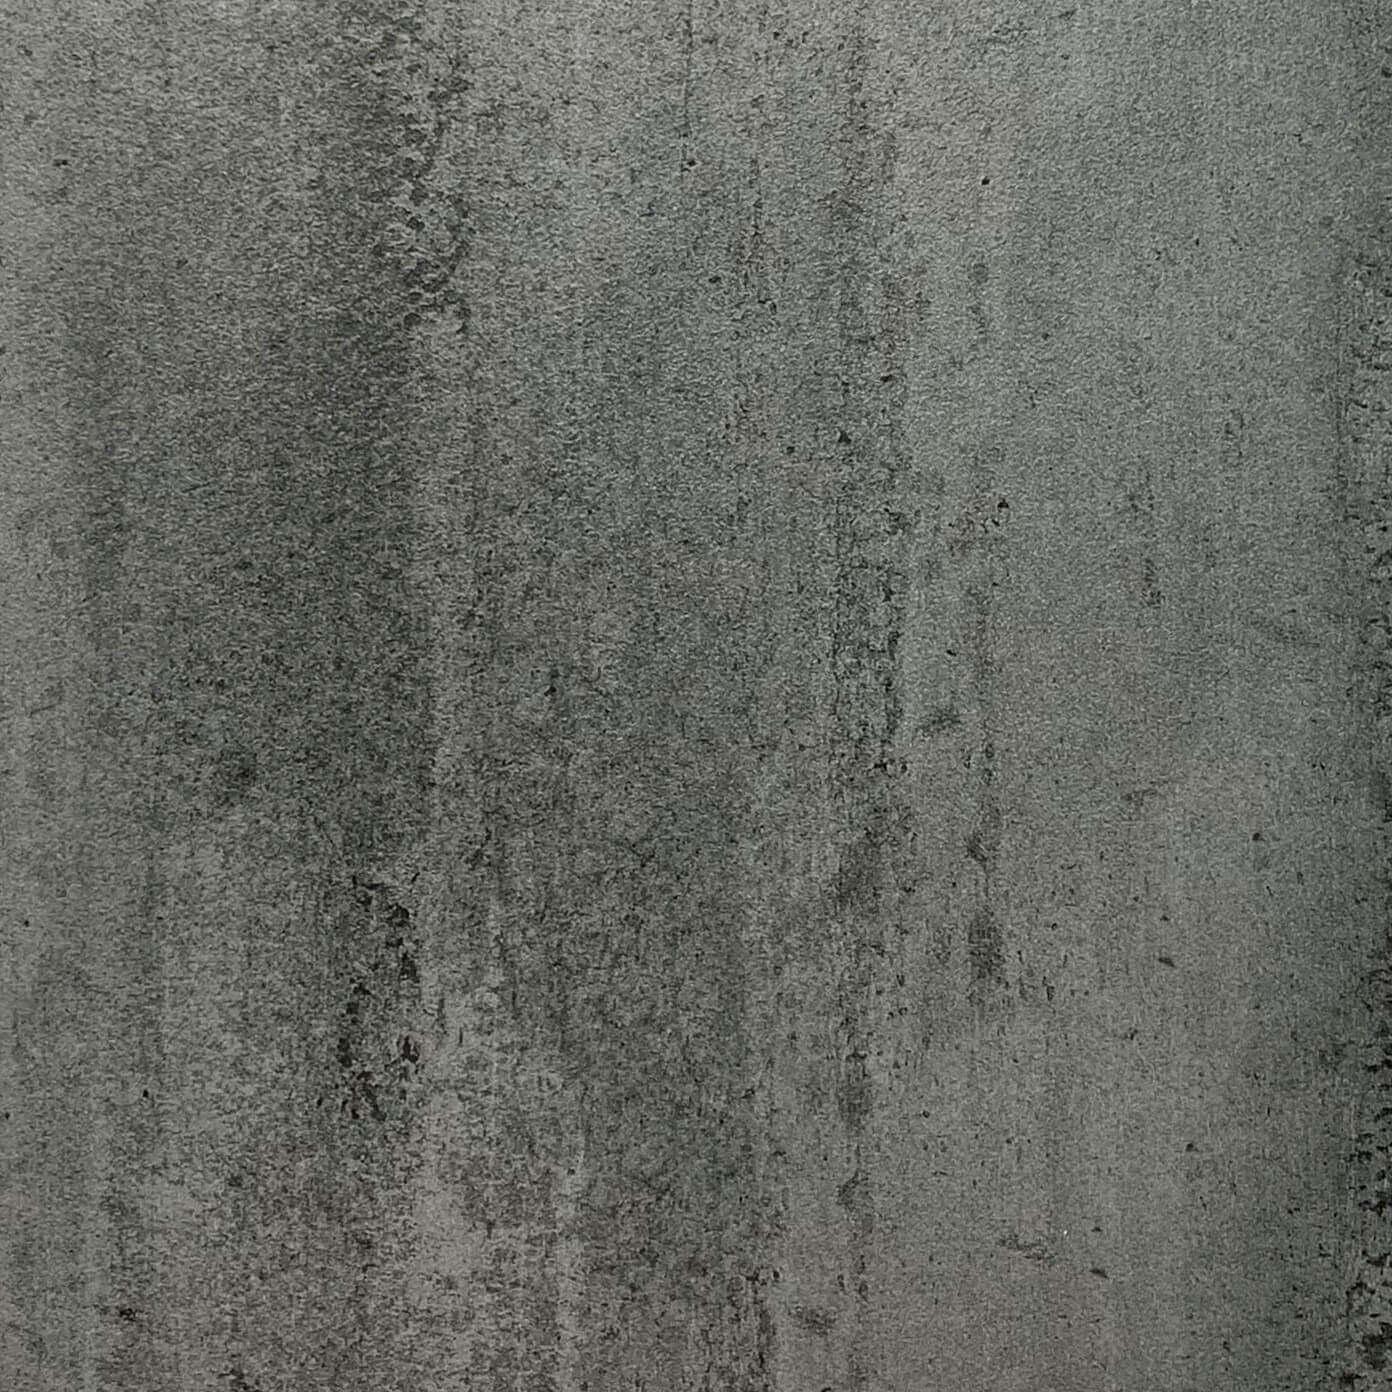 Dark Grey Lappato Finish Rectified Porcelain Tile 6917